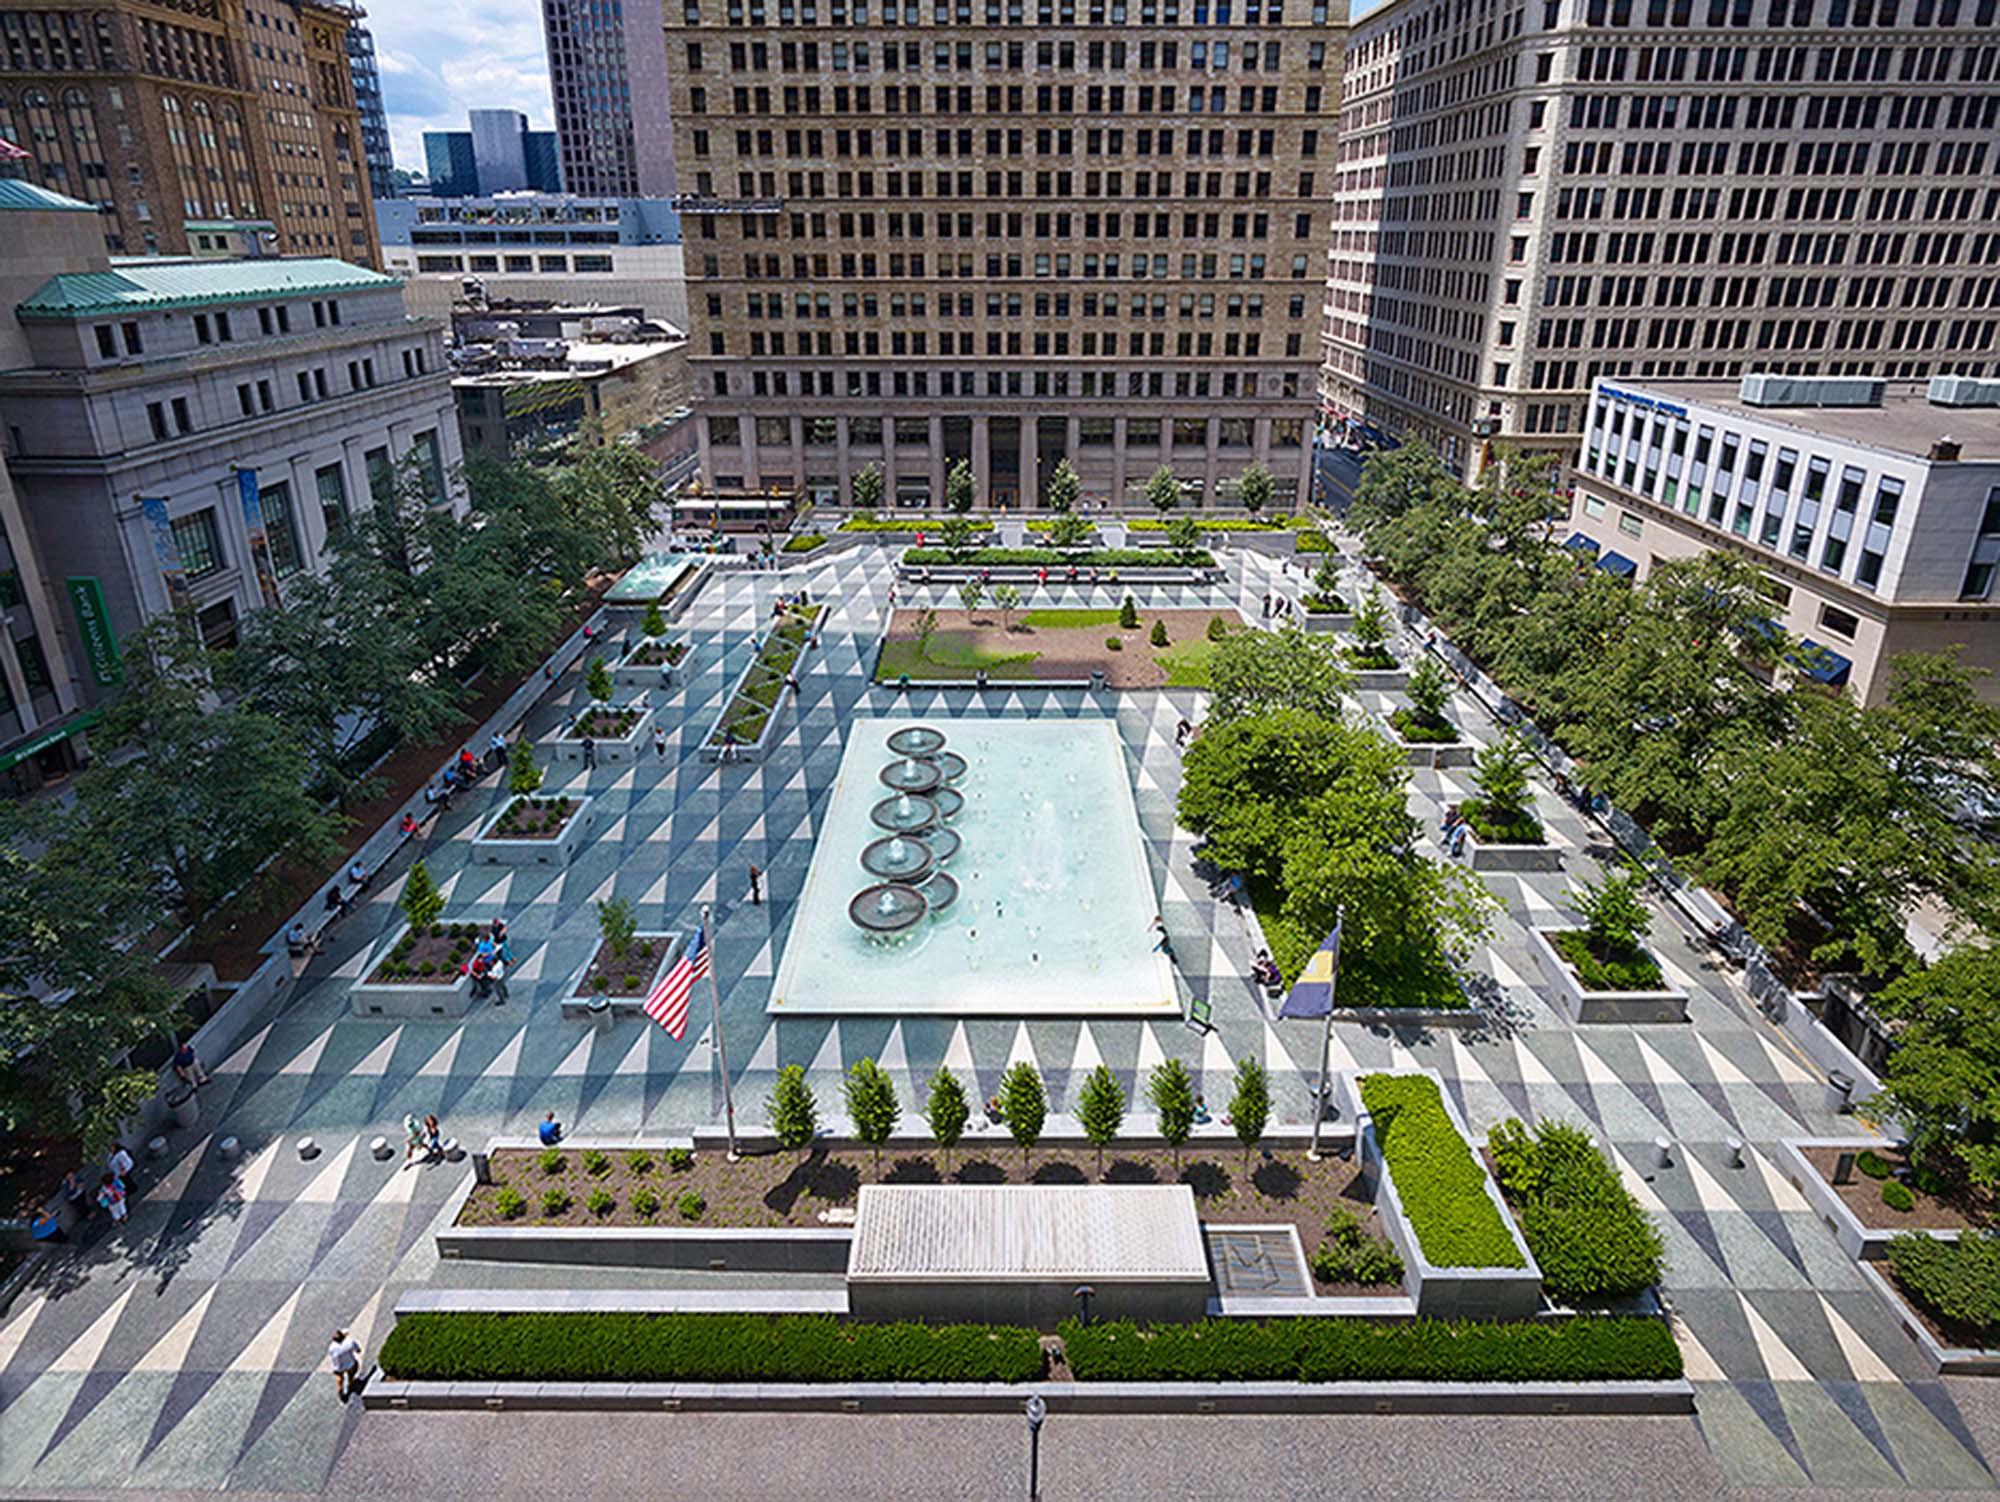 Courtyard Plans Mellon Square Architect Magazine Simonds Amp Simonds